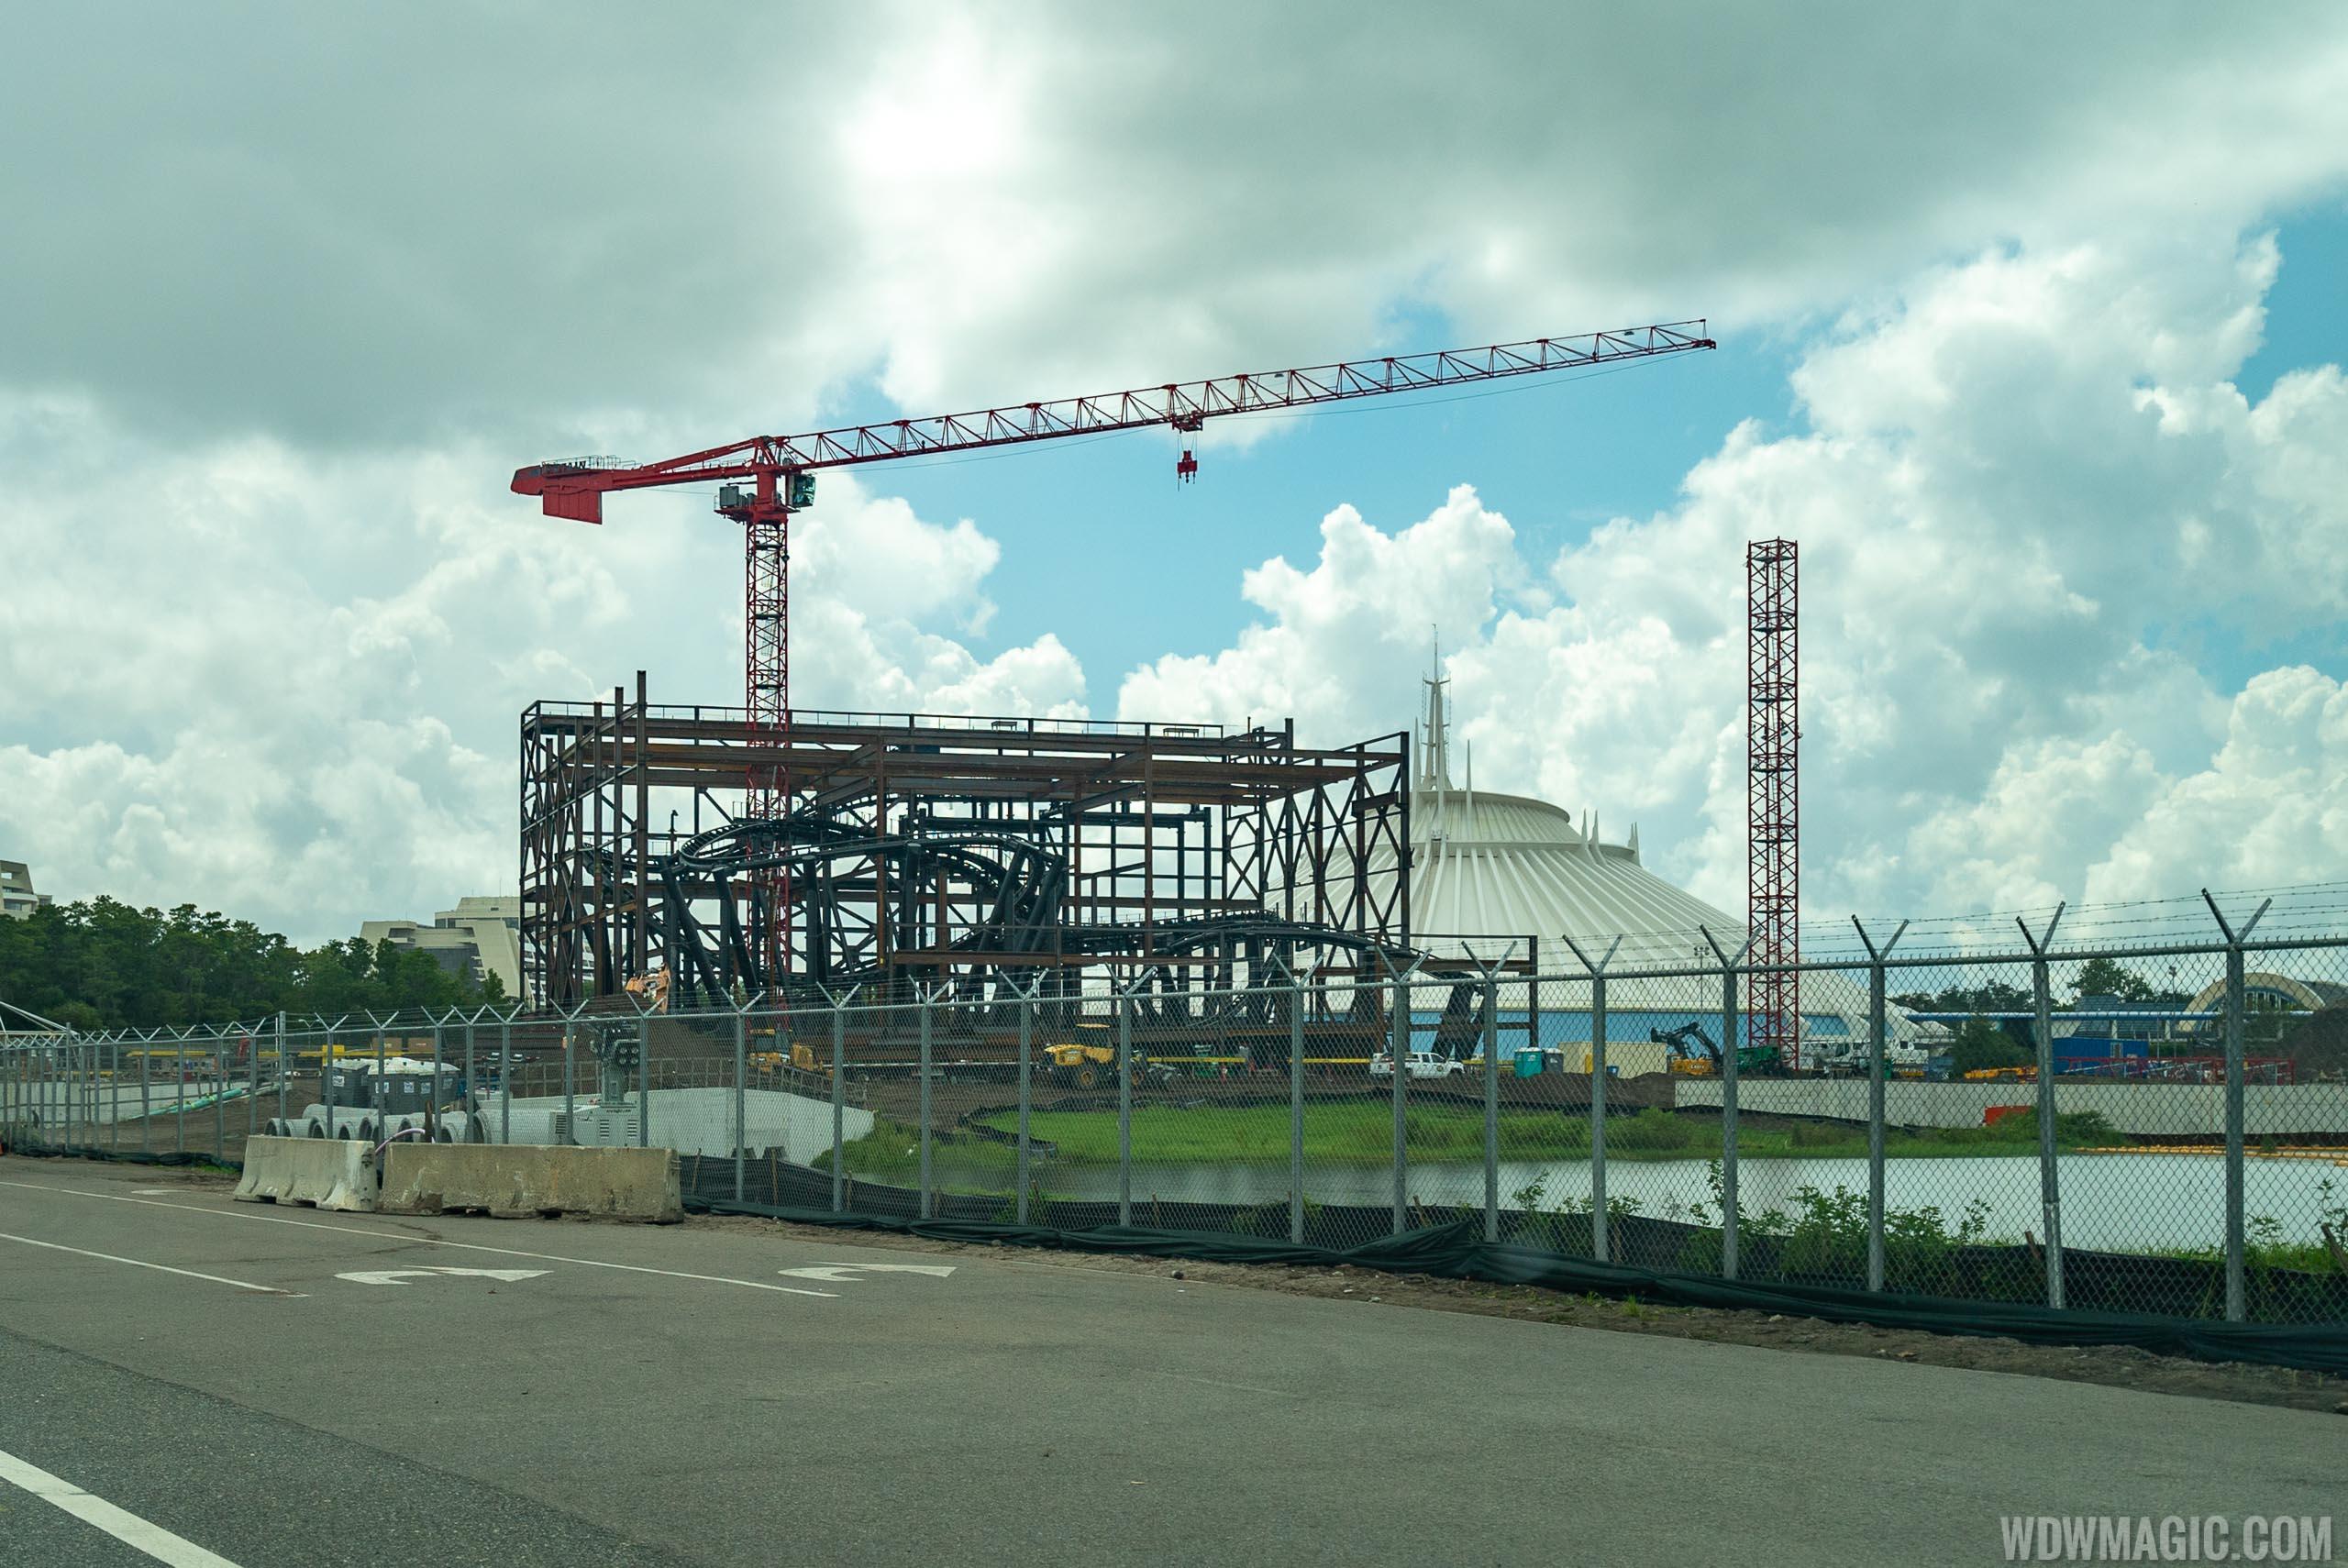 TRON Lightcyle Run construction site - August 2019